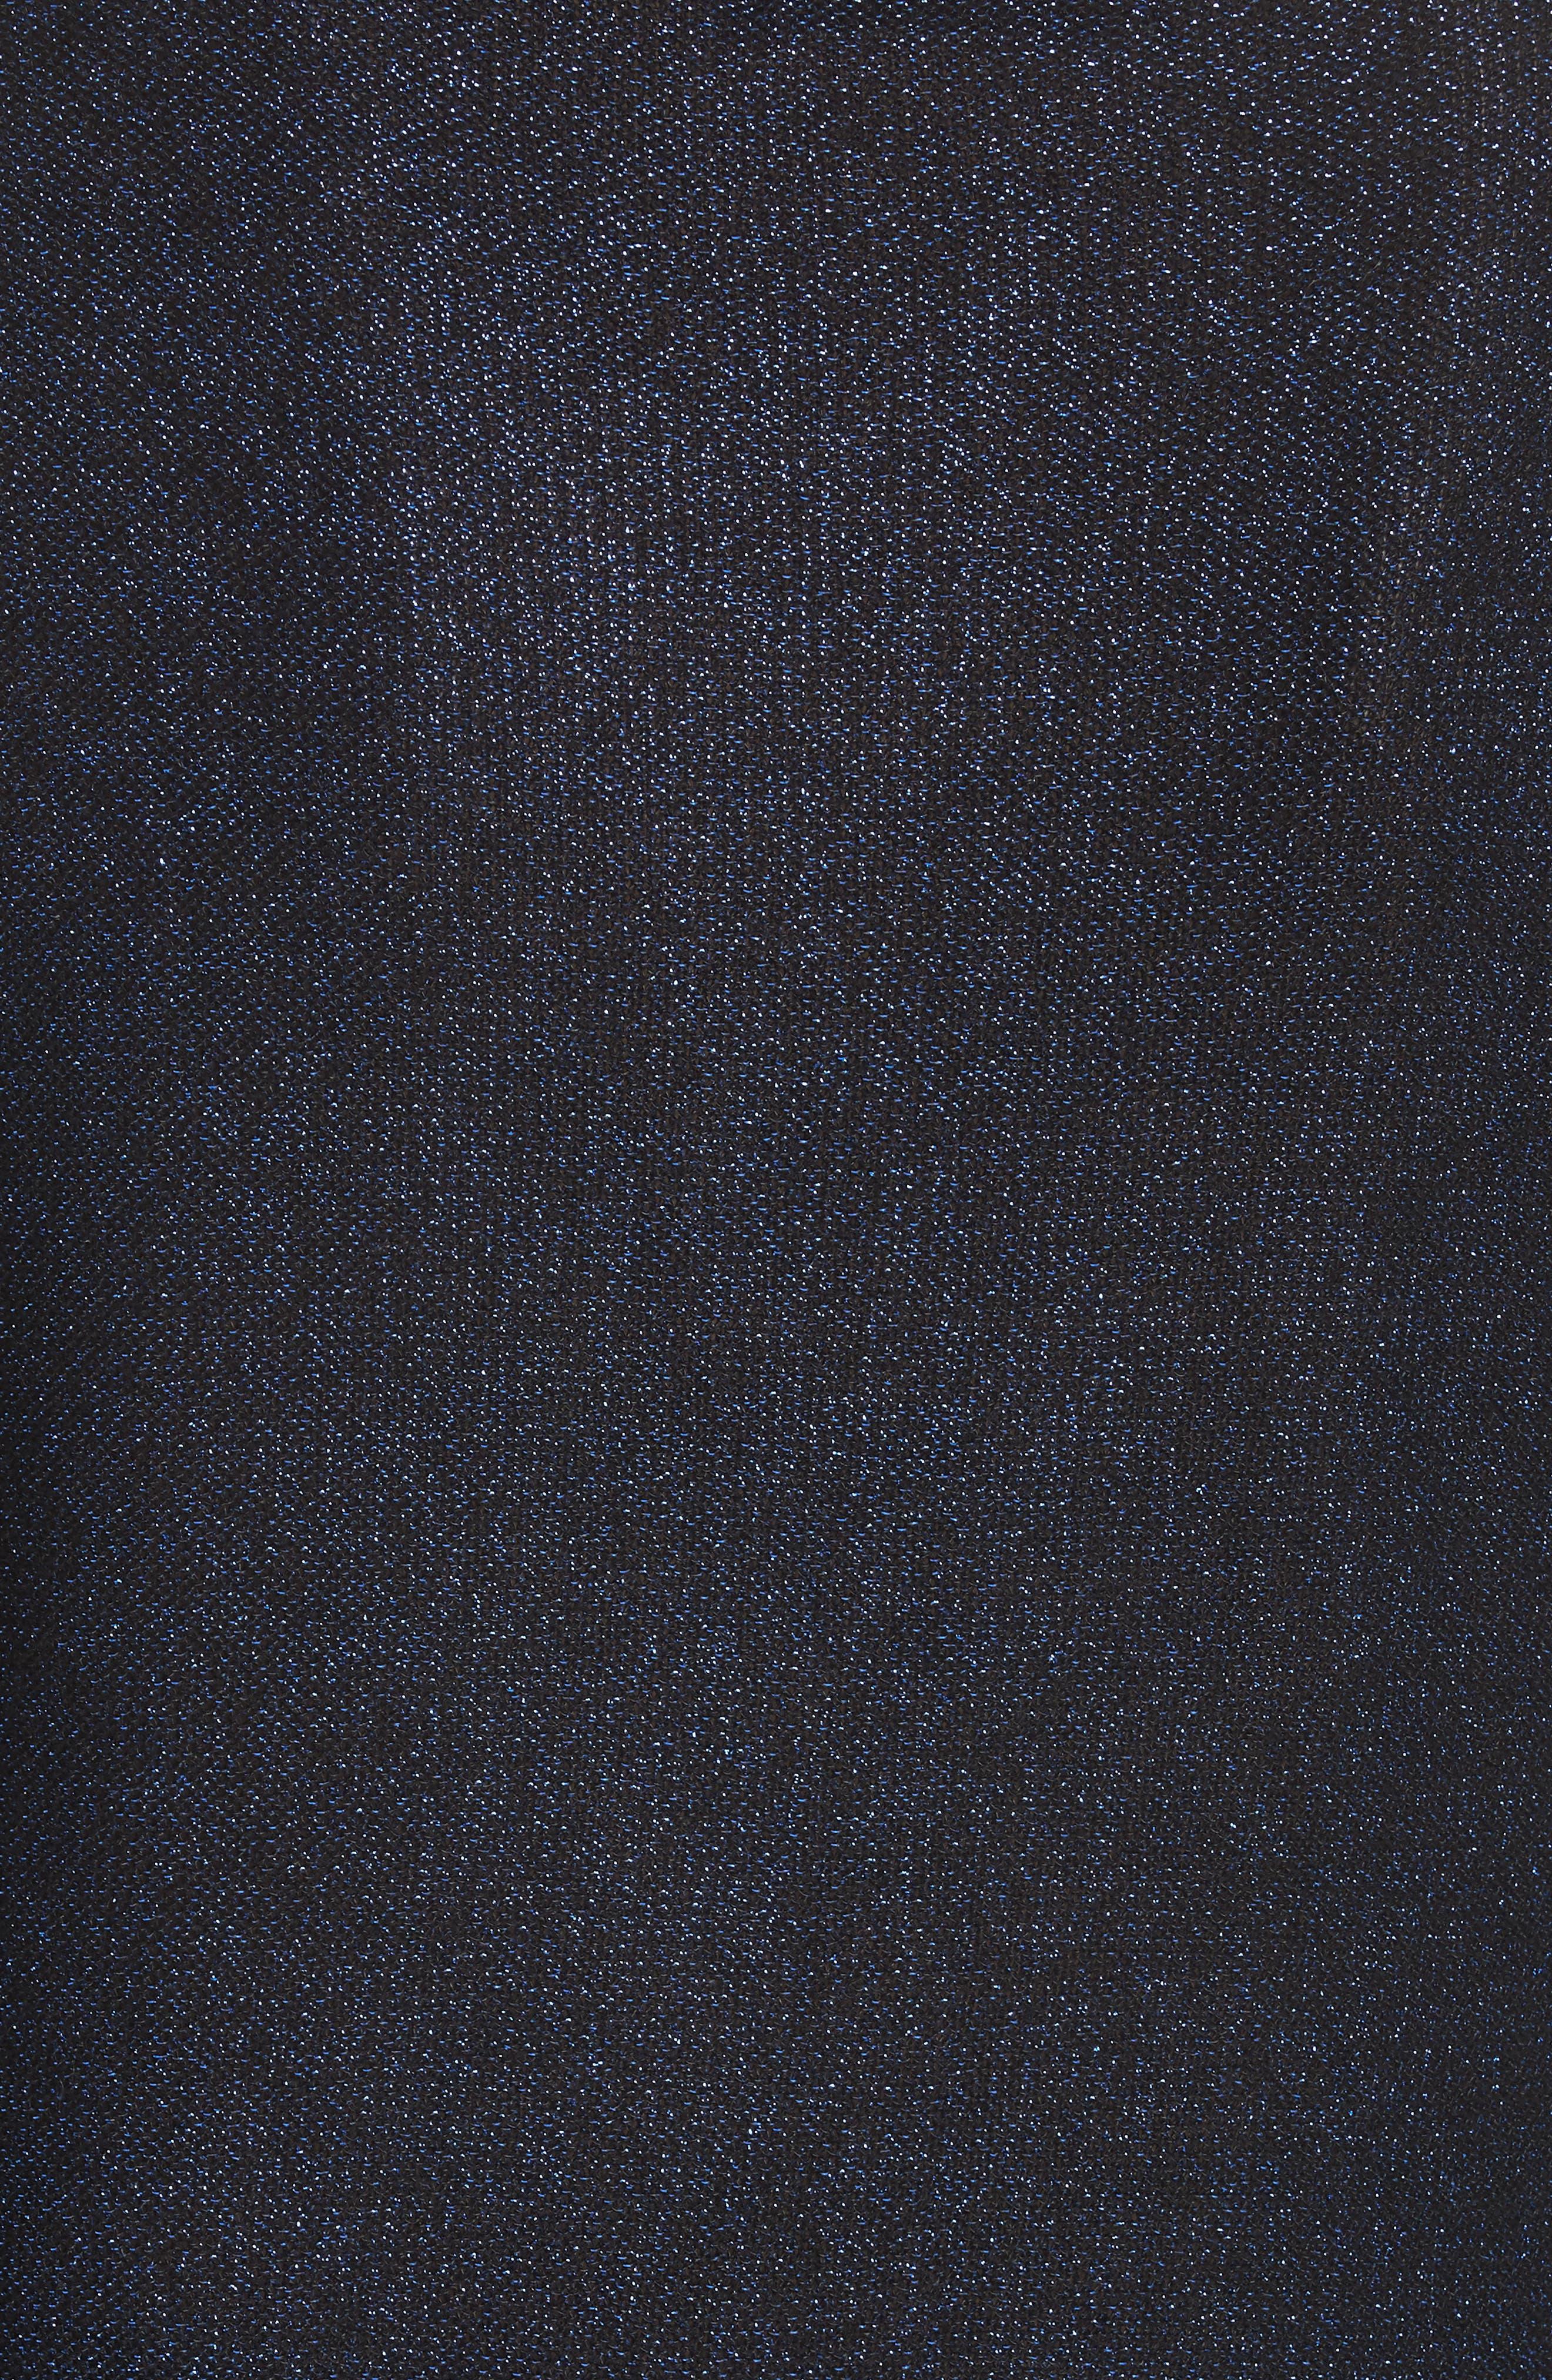 Metallic Shimmer Cotton Blend Sweater,                             Alternate thumbnail 5, color,                             COBALT